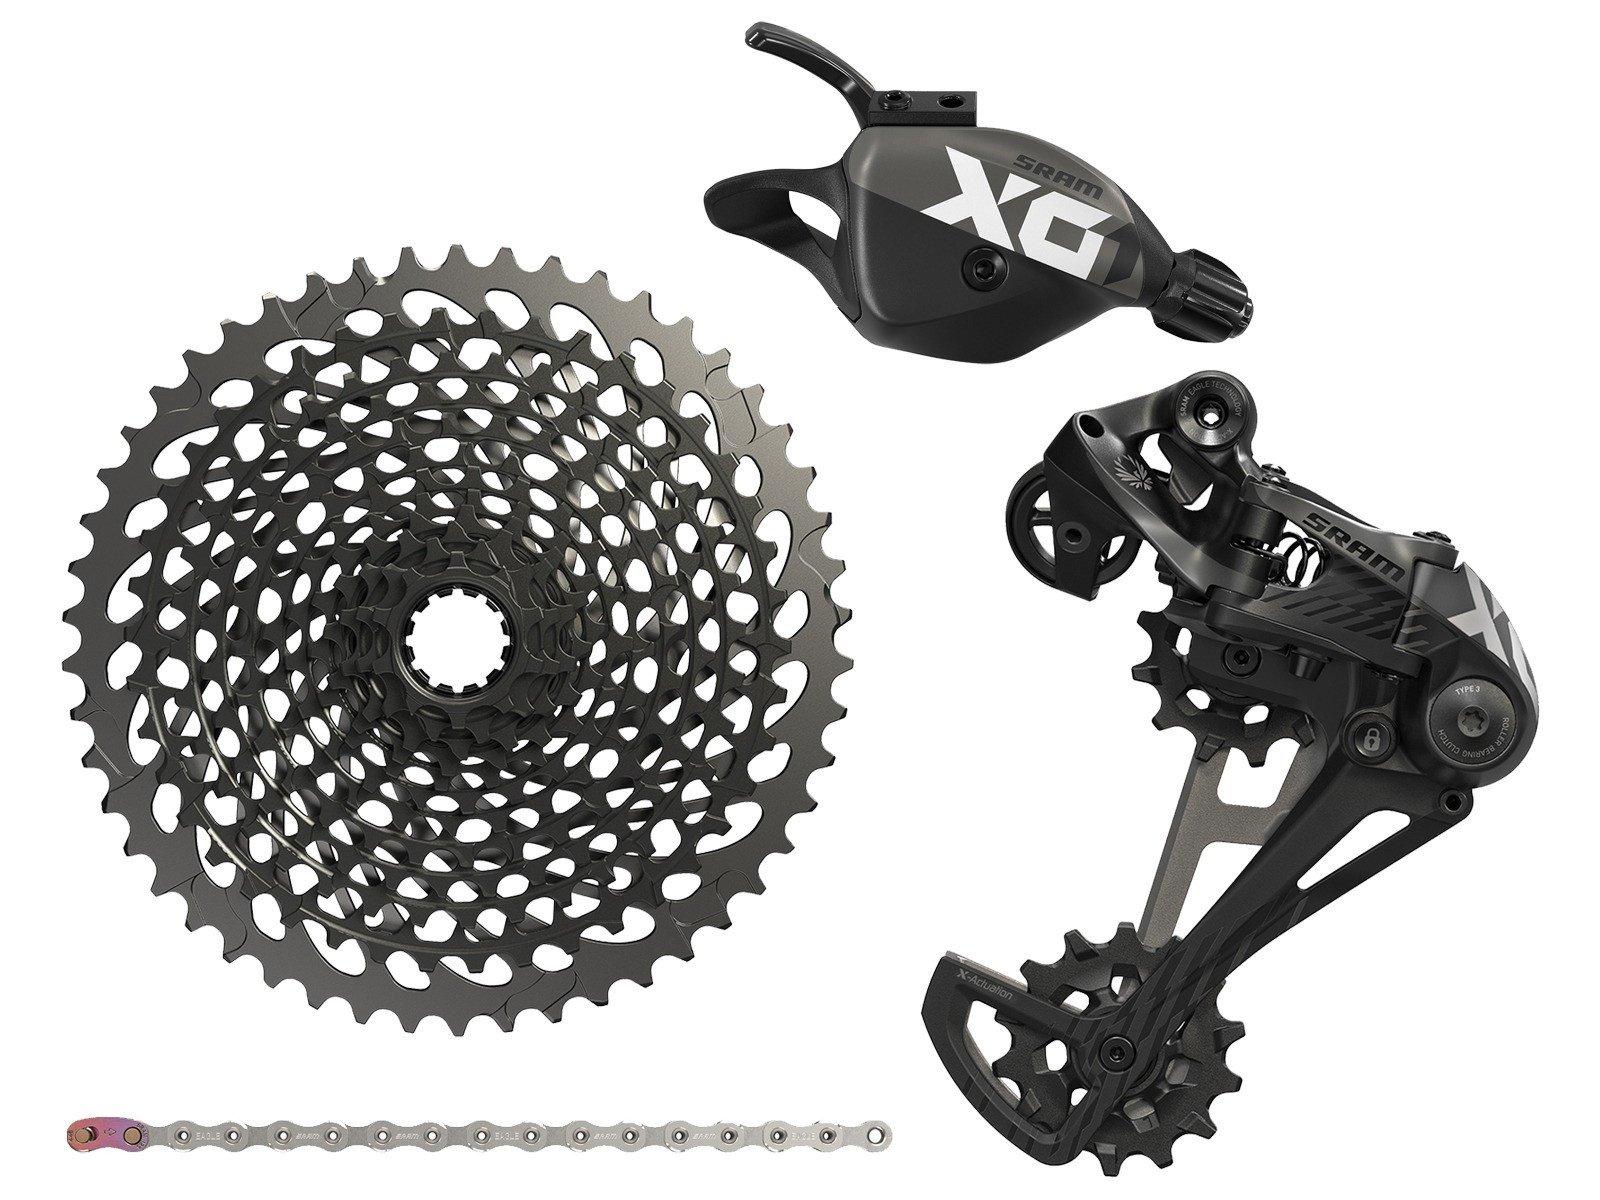 SRAM X01 Eagle 1x12 Upgrade Kit